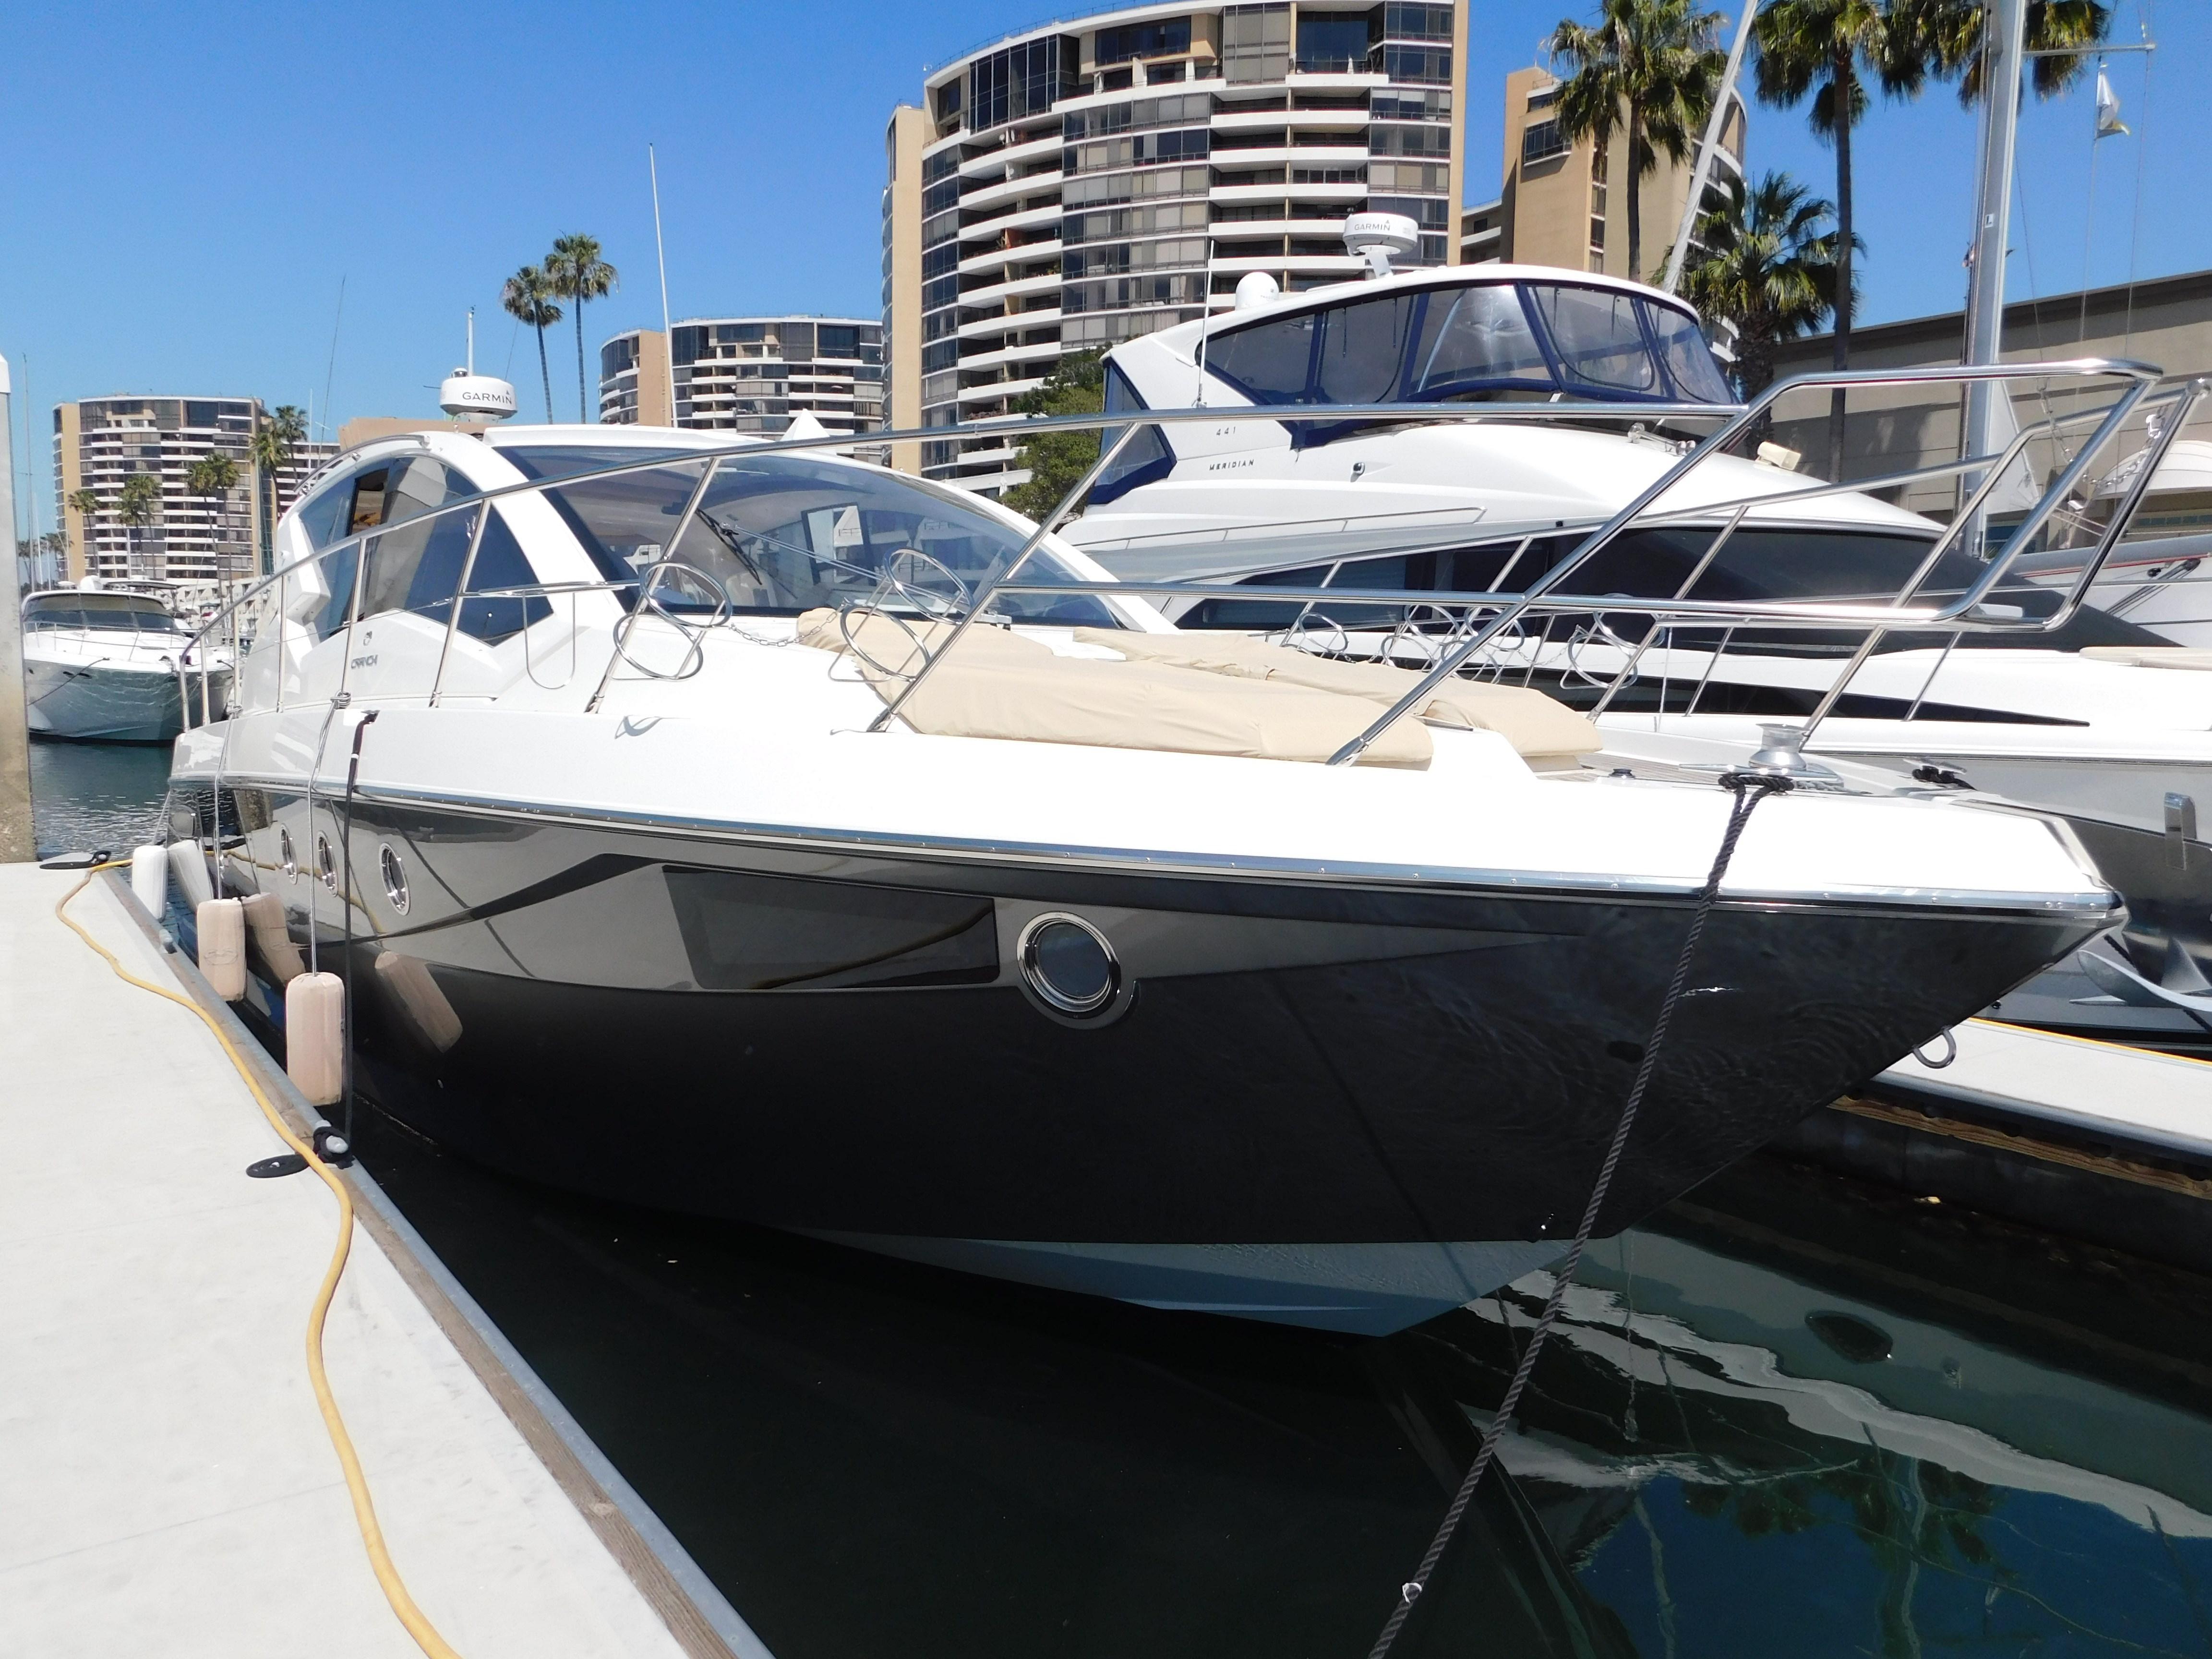 2015 Cranchi M44 HT Power Boat For Sale - www.yachtworld.com